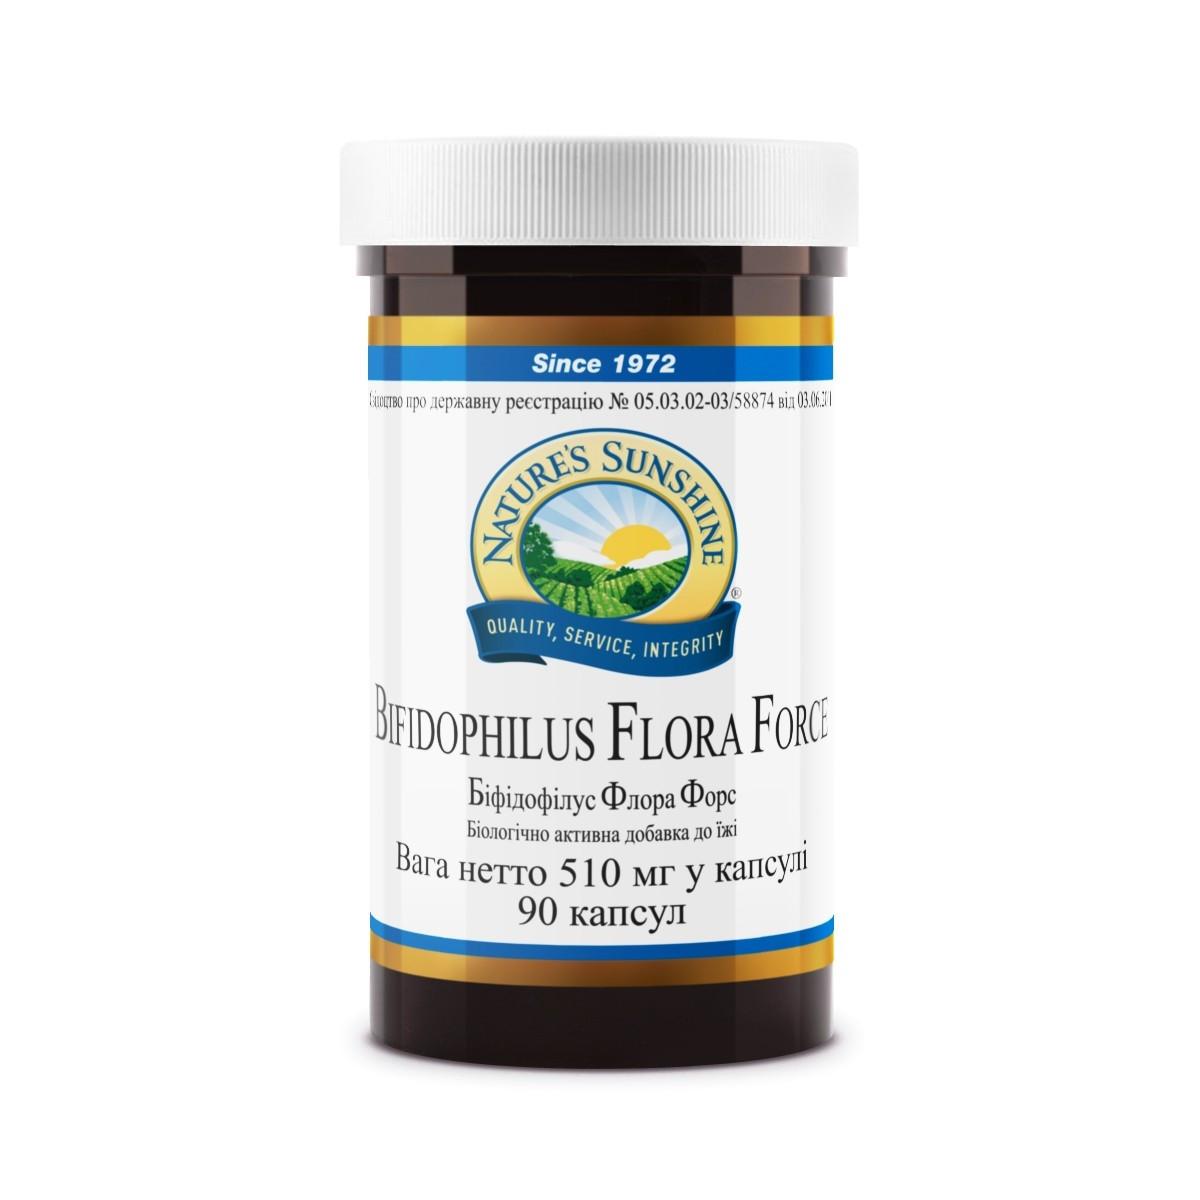 Bifidophilus Flora Force Бифидофилус Флора Форс, NSP, США